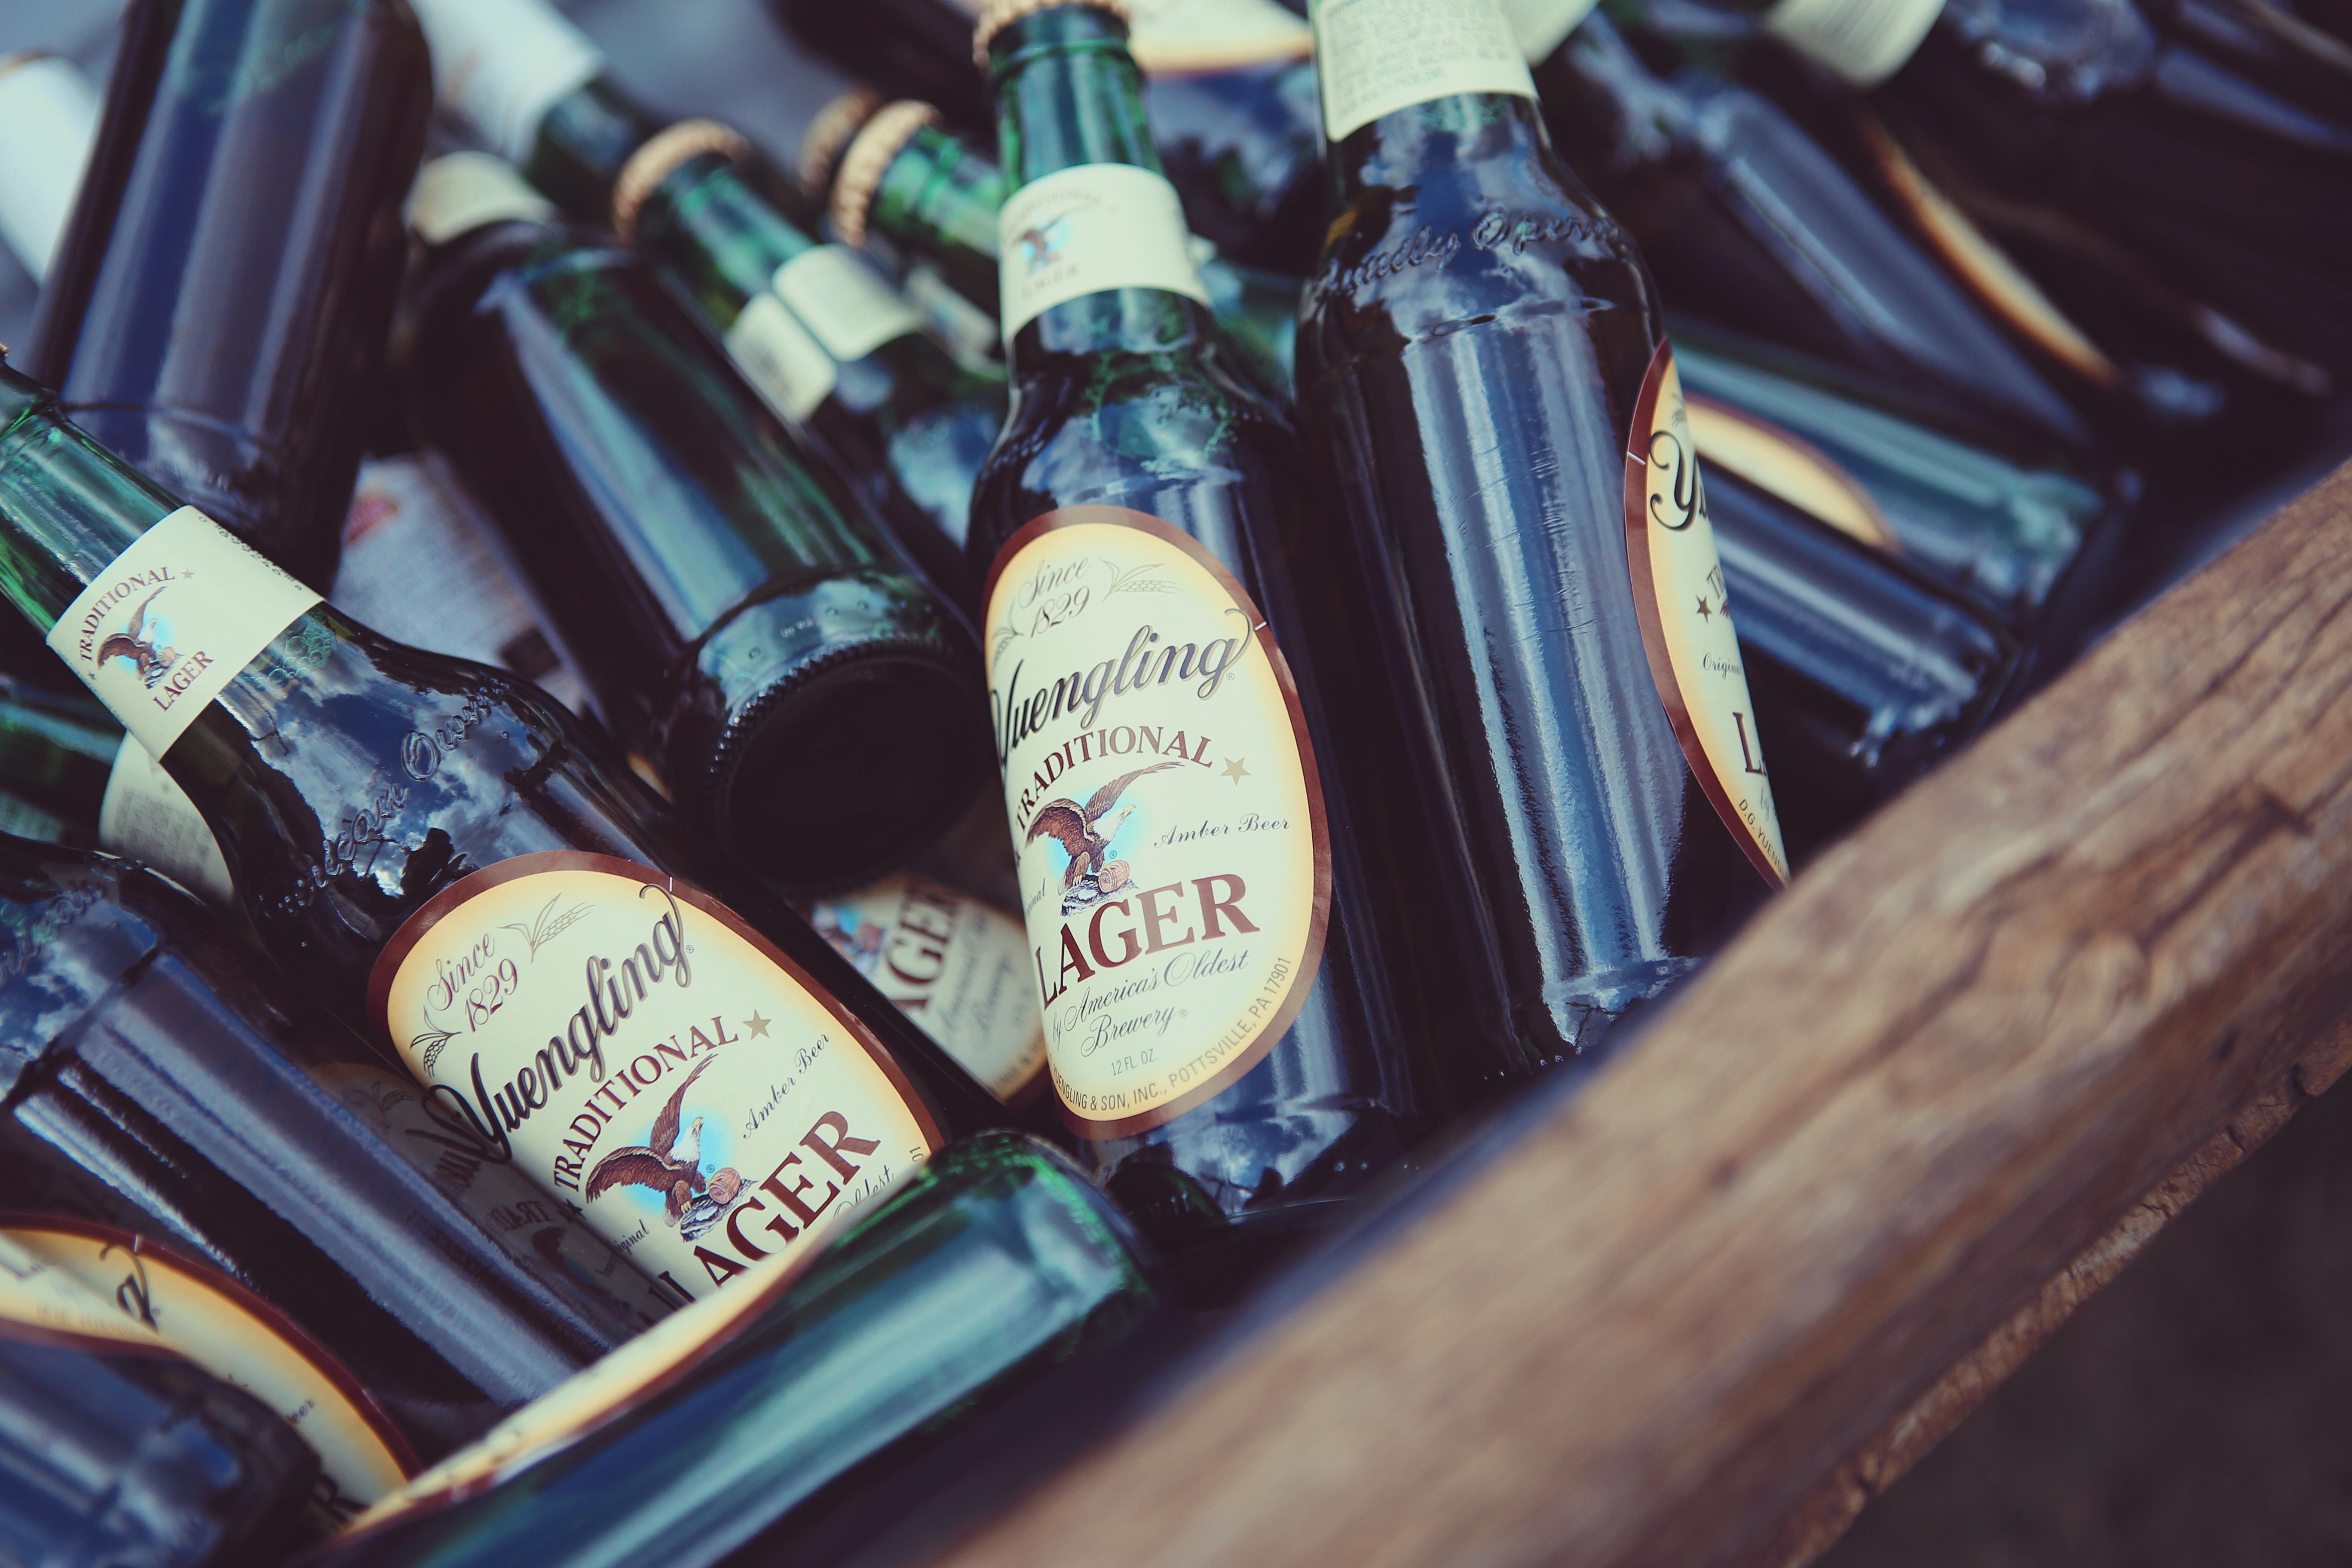 Lager bottle lot on wood